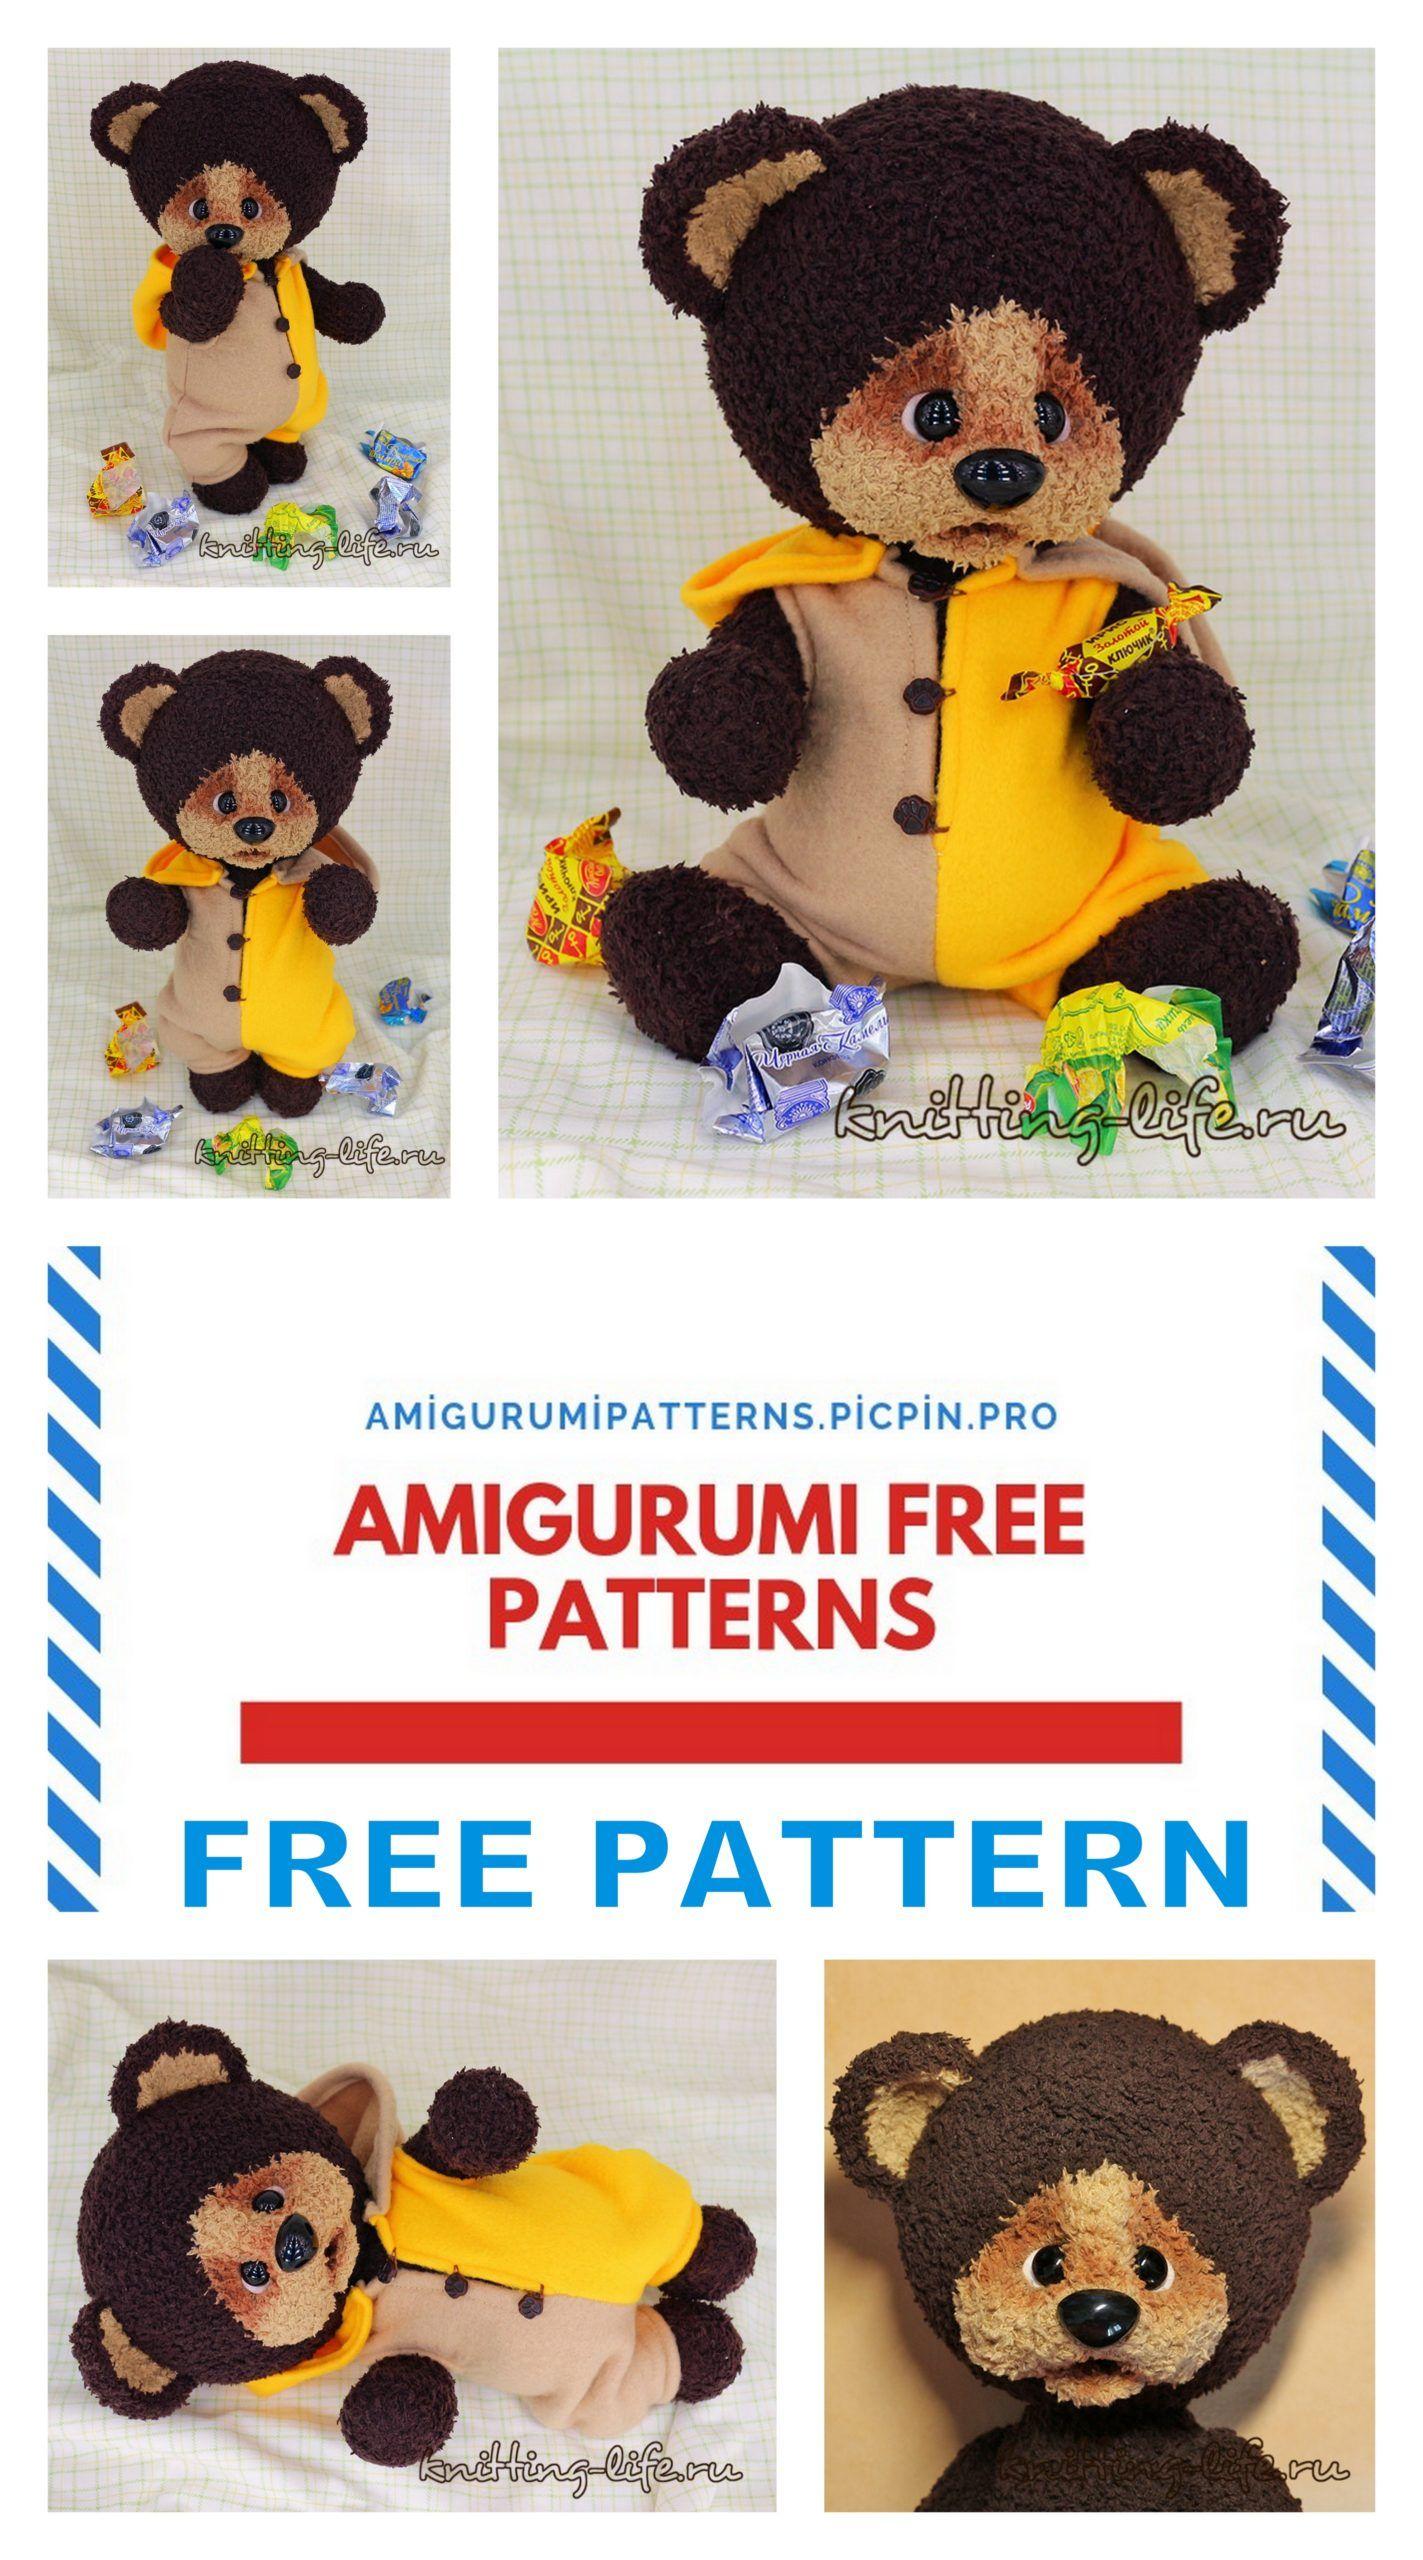 Amigurumi Teddy Bear Crochet Free Pattern | Crochet teddy bear ... | 2560x1423